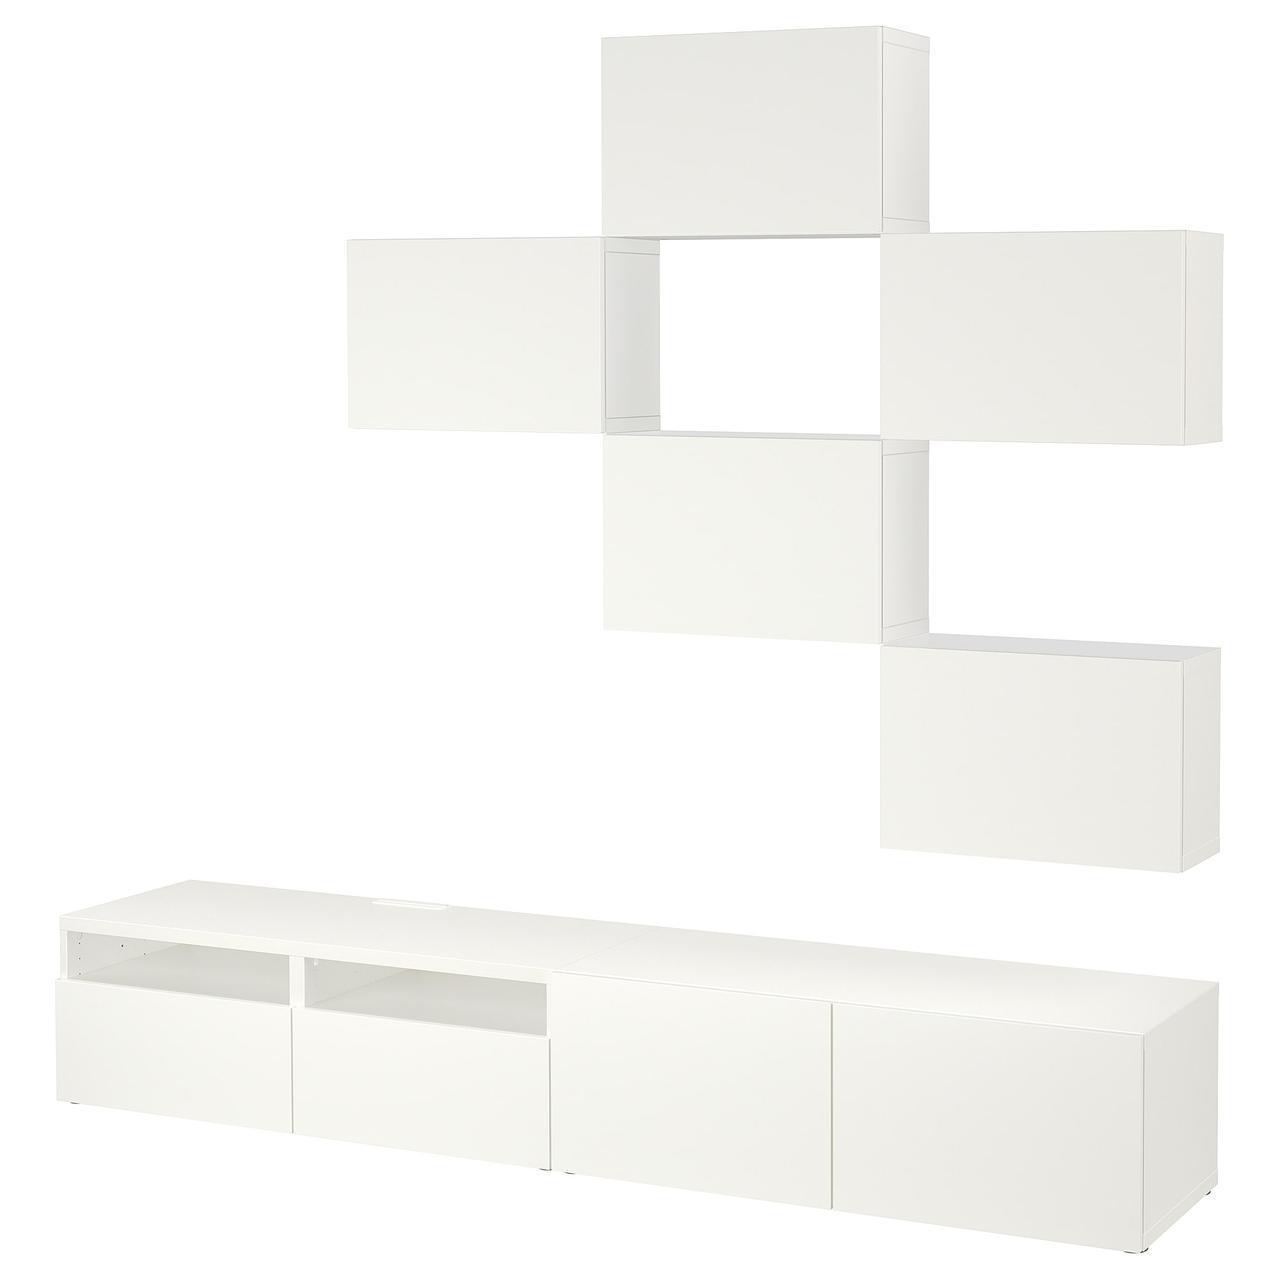 IKEA BESTA Тумба под телевизор, Лаппвикен белый  (591.916.39)